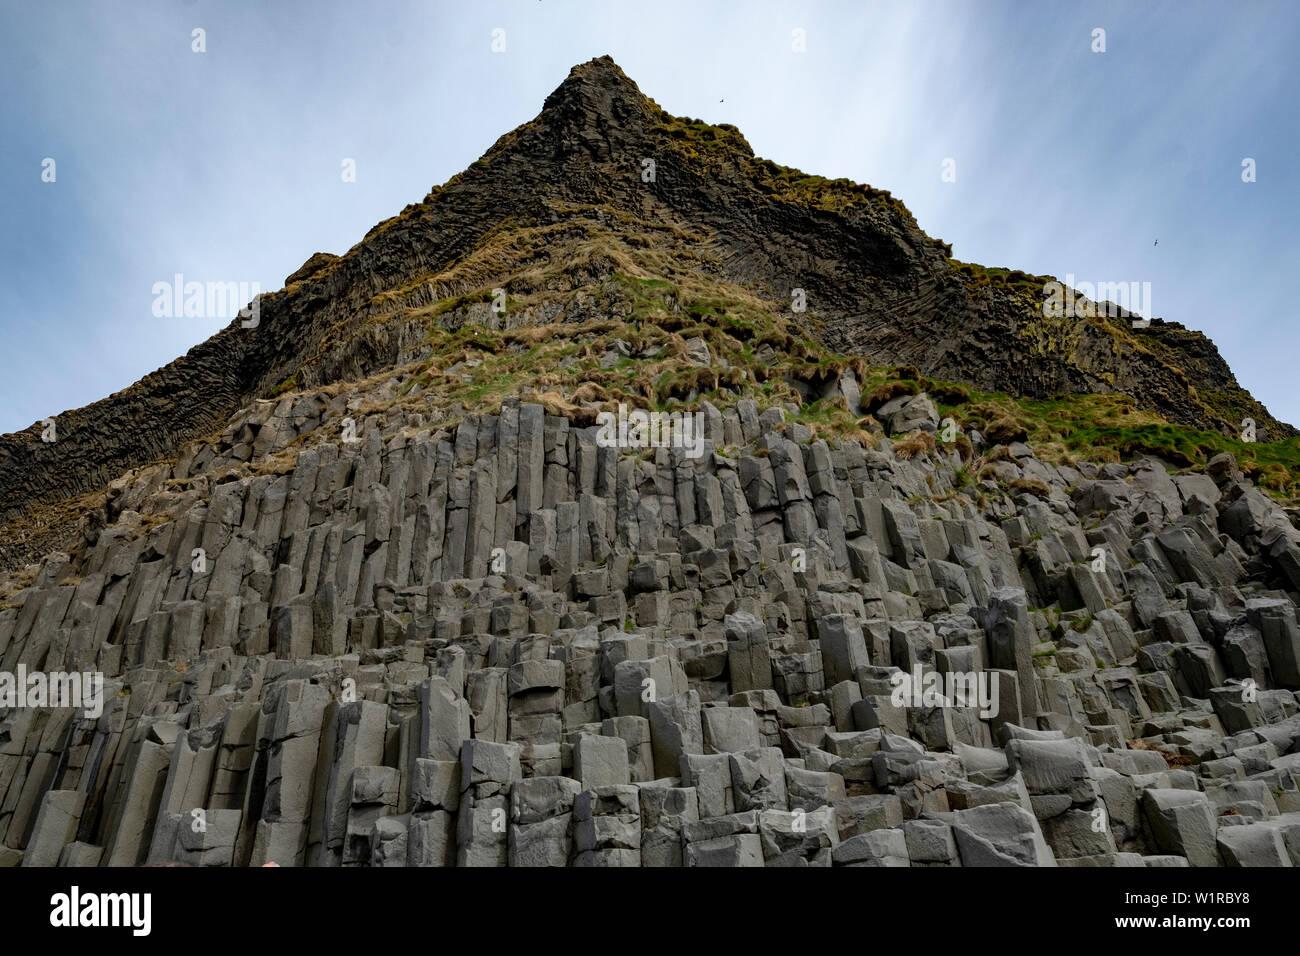 Unusual rock formations on the black sand beach of Reynisfjara, Iceland - Stock Image